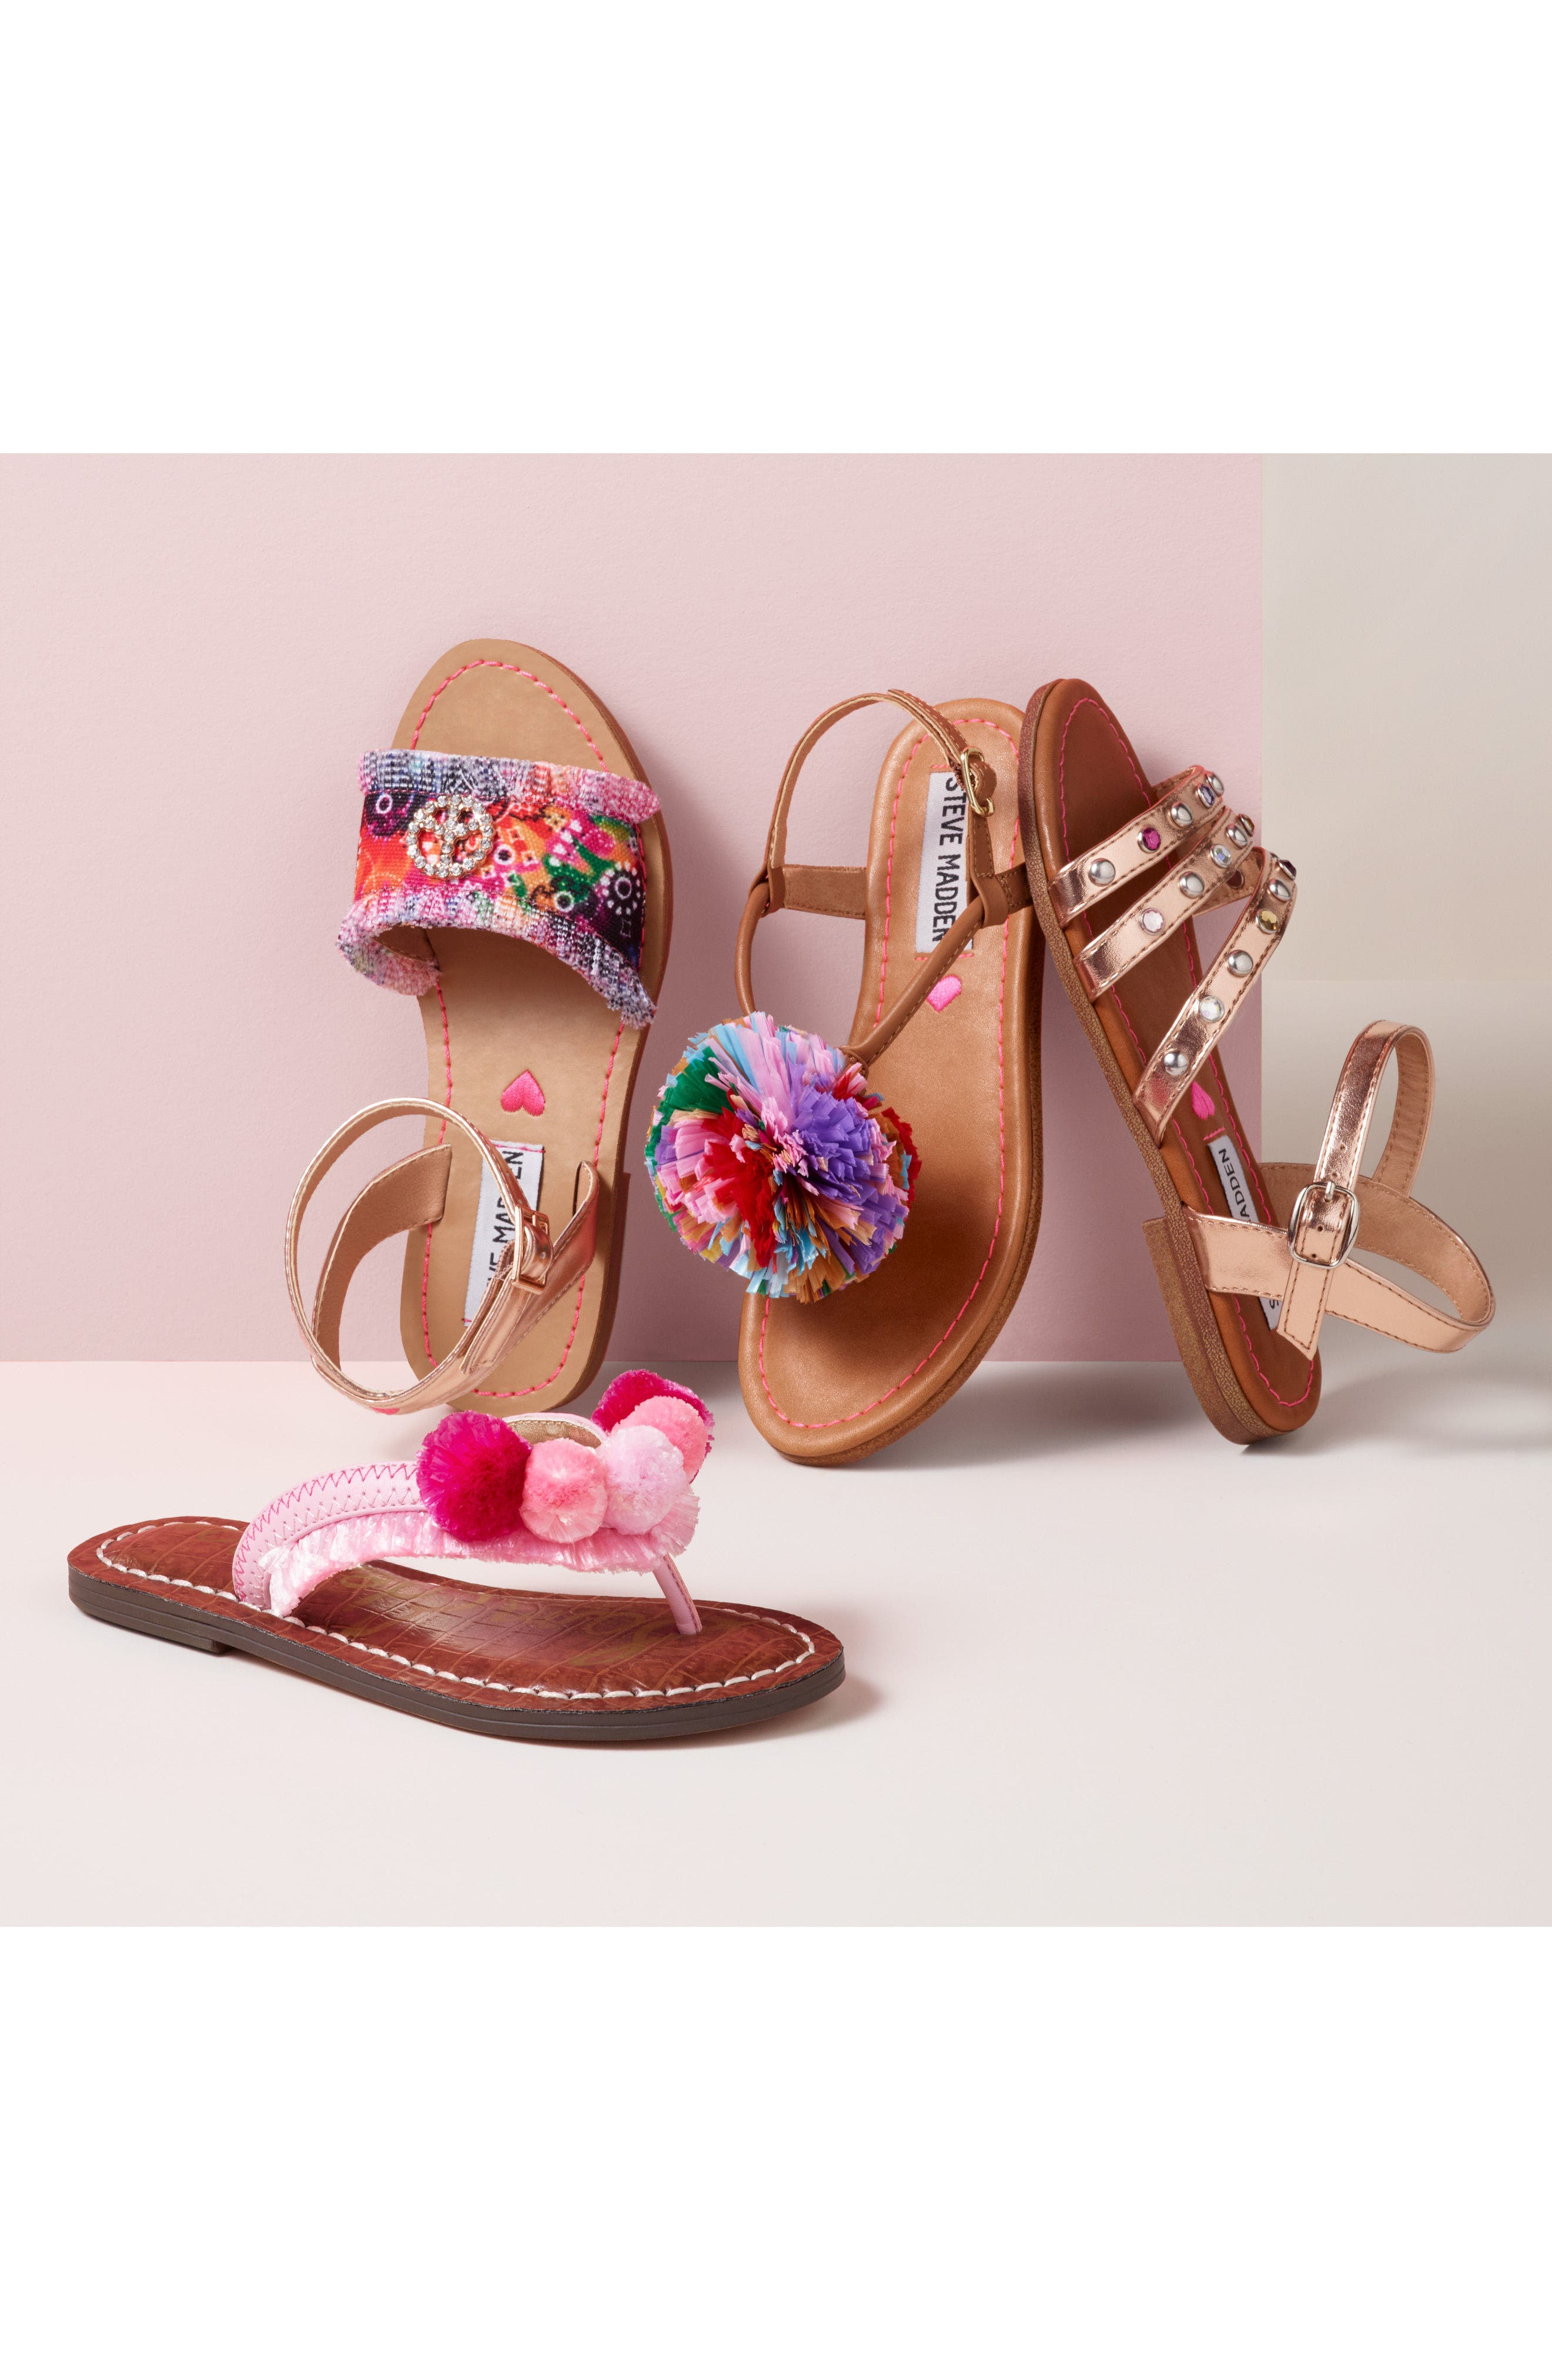 JVILLA Ankle Strap Sandal,                             Alternate thumbnail 7, color,